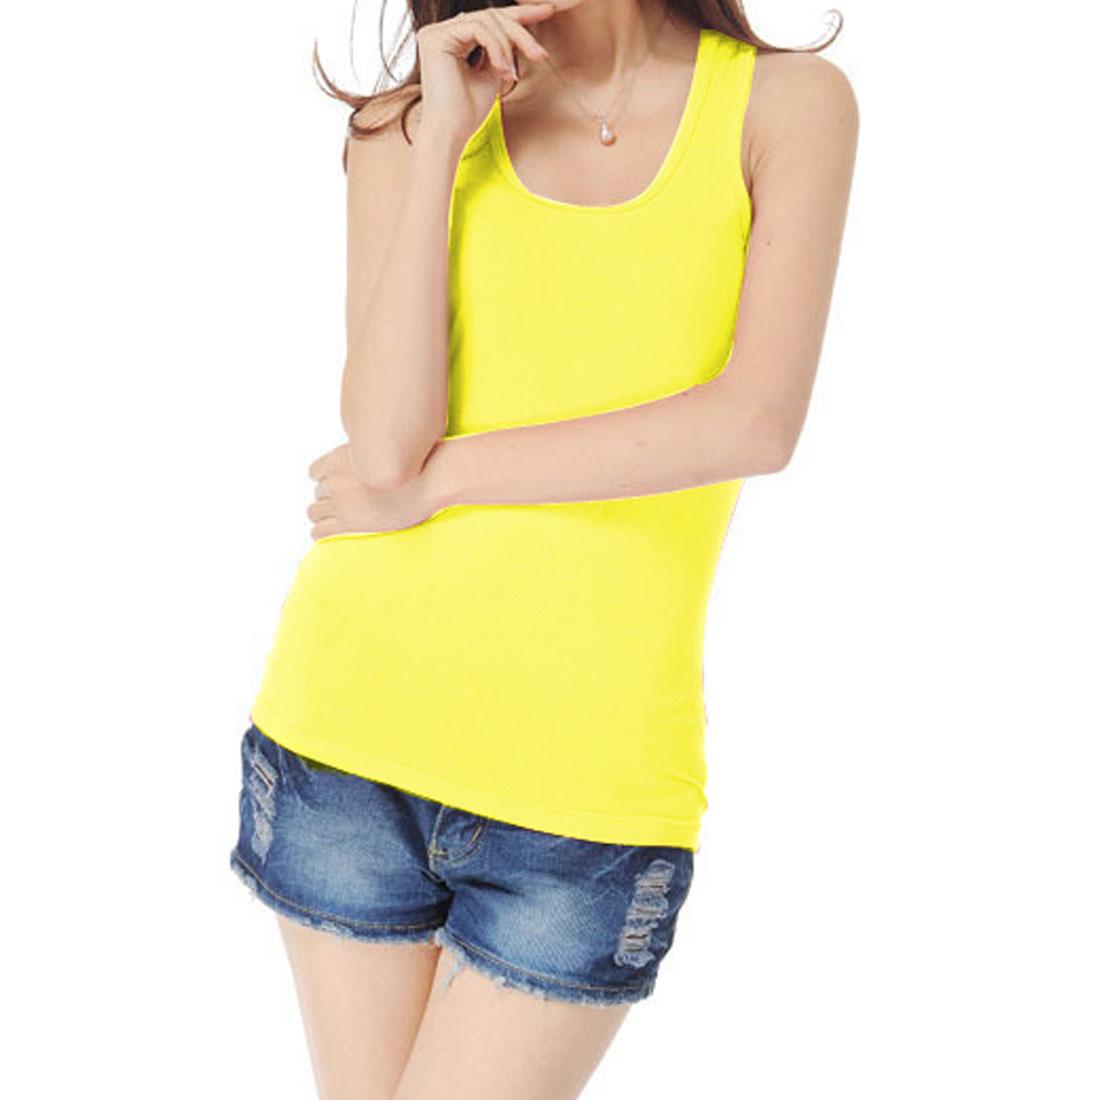 Ladies Solid Yellow Sleeveless Elastic Racerback Tank Top XS